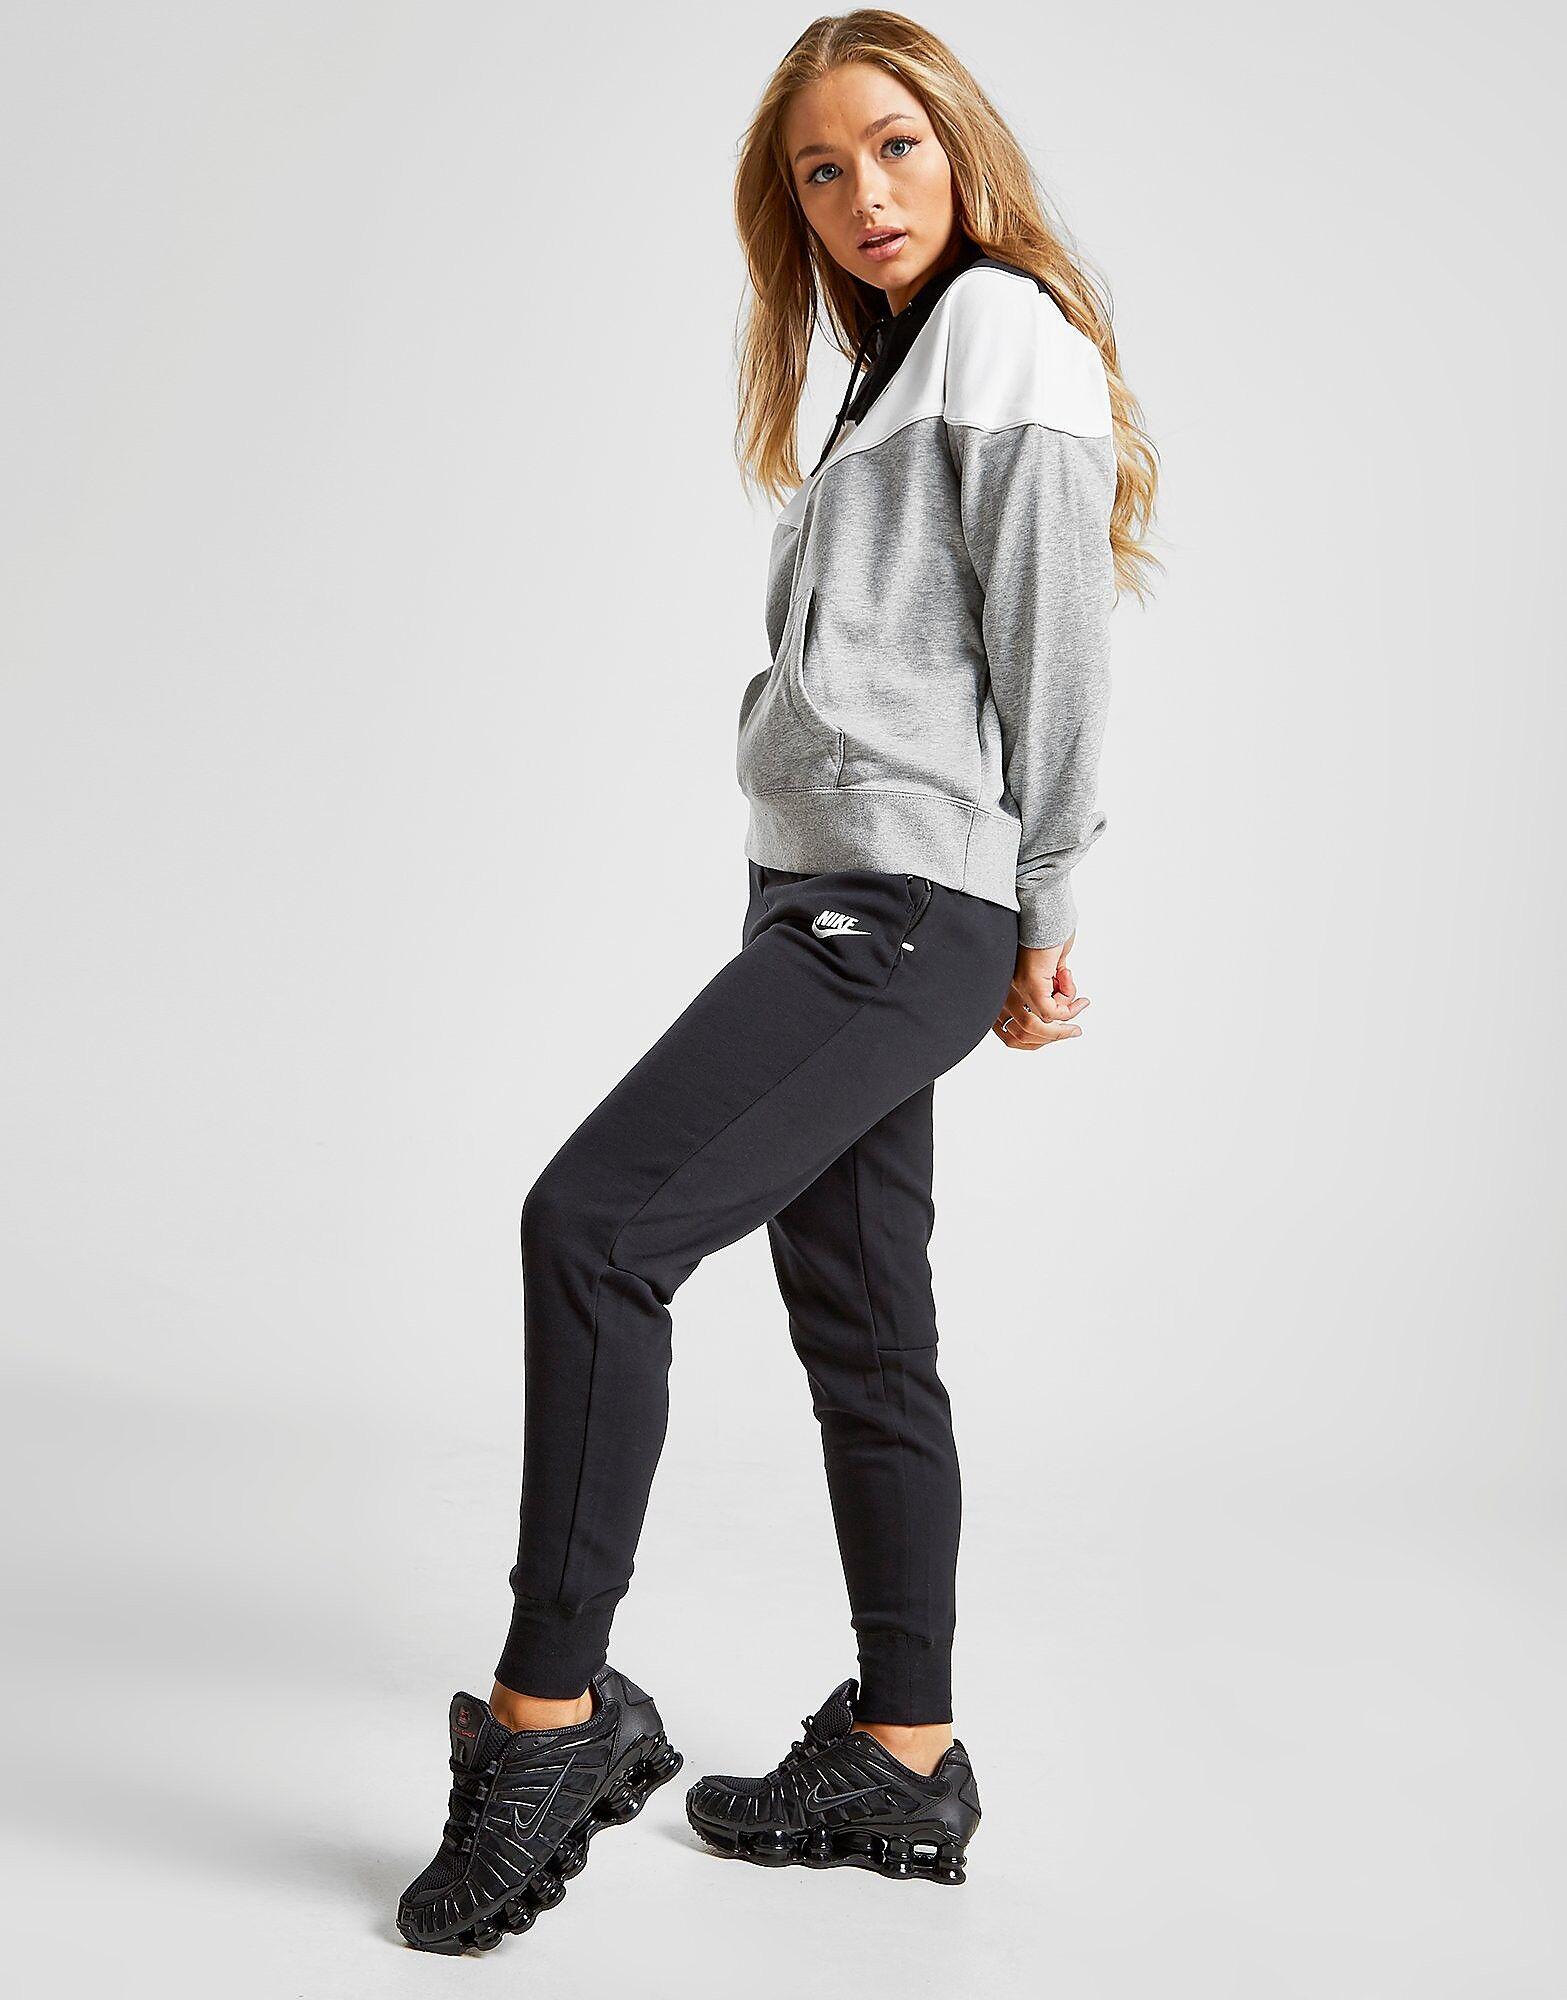 Image of Nike Tech Fleece Joggers - Womens, Musta